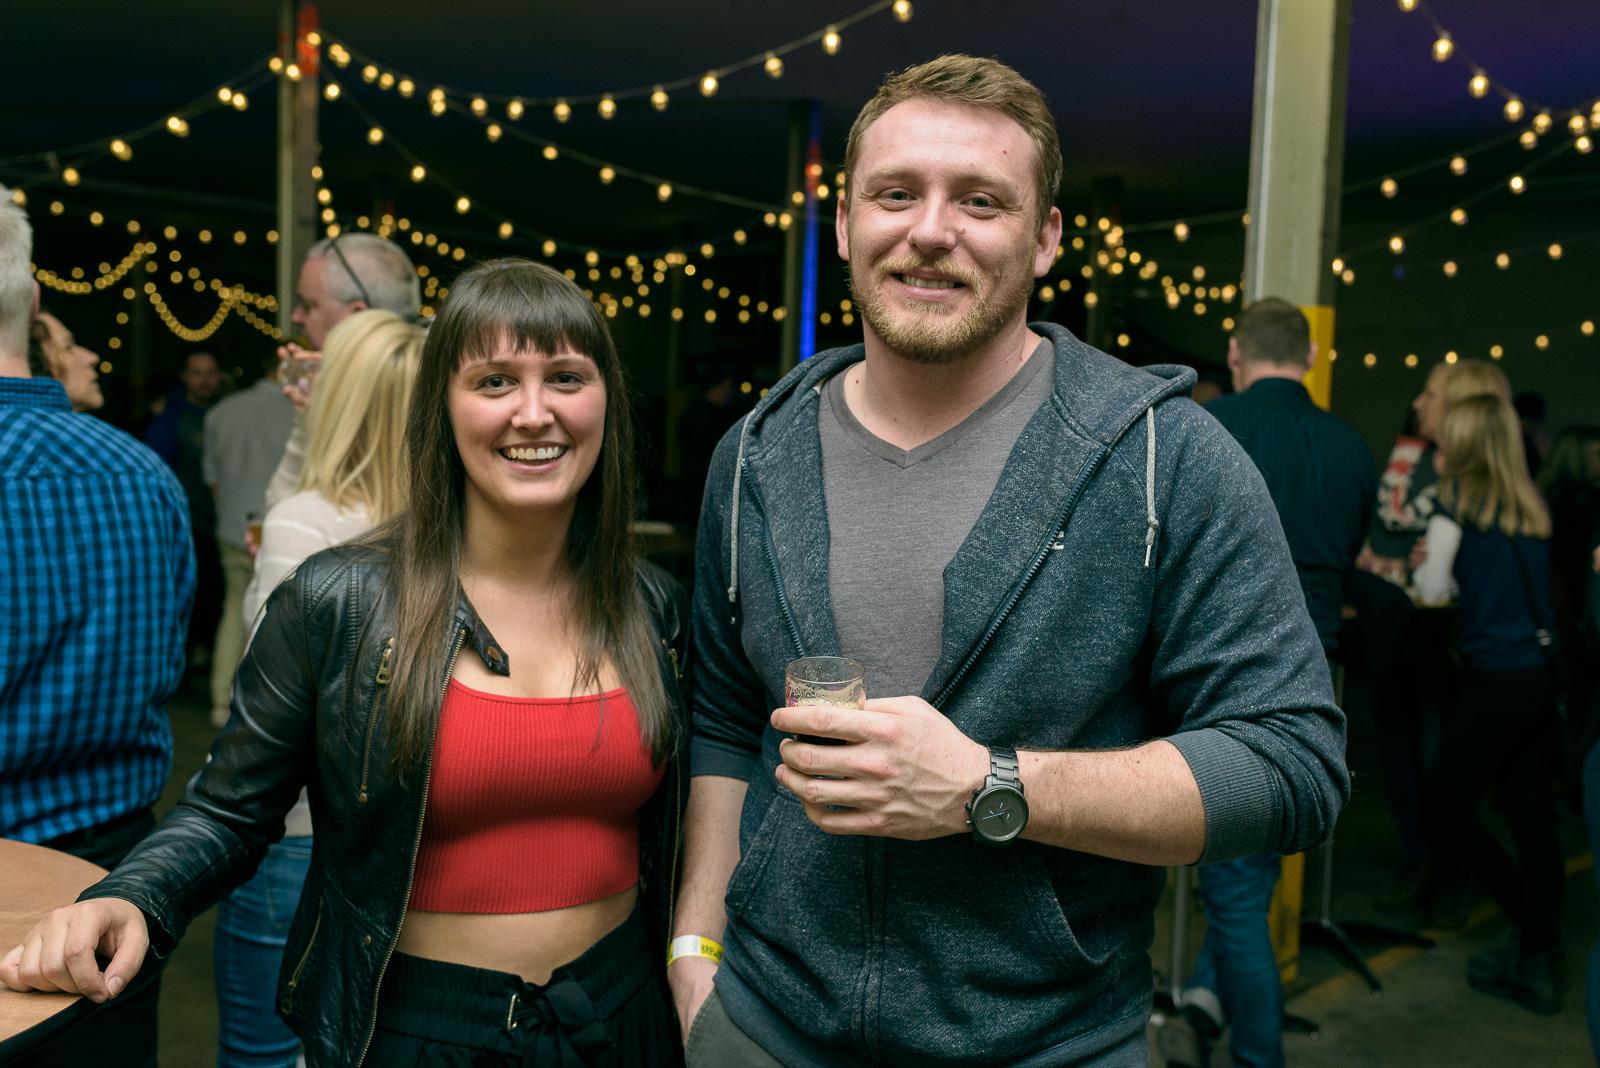 brewha-caskfest-blog-44.jpg